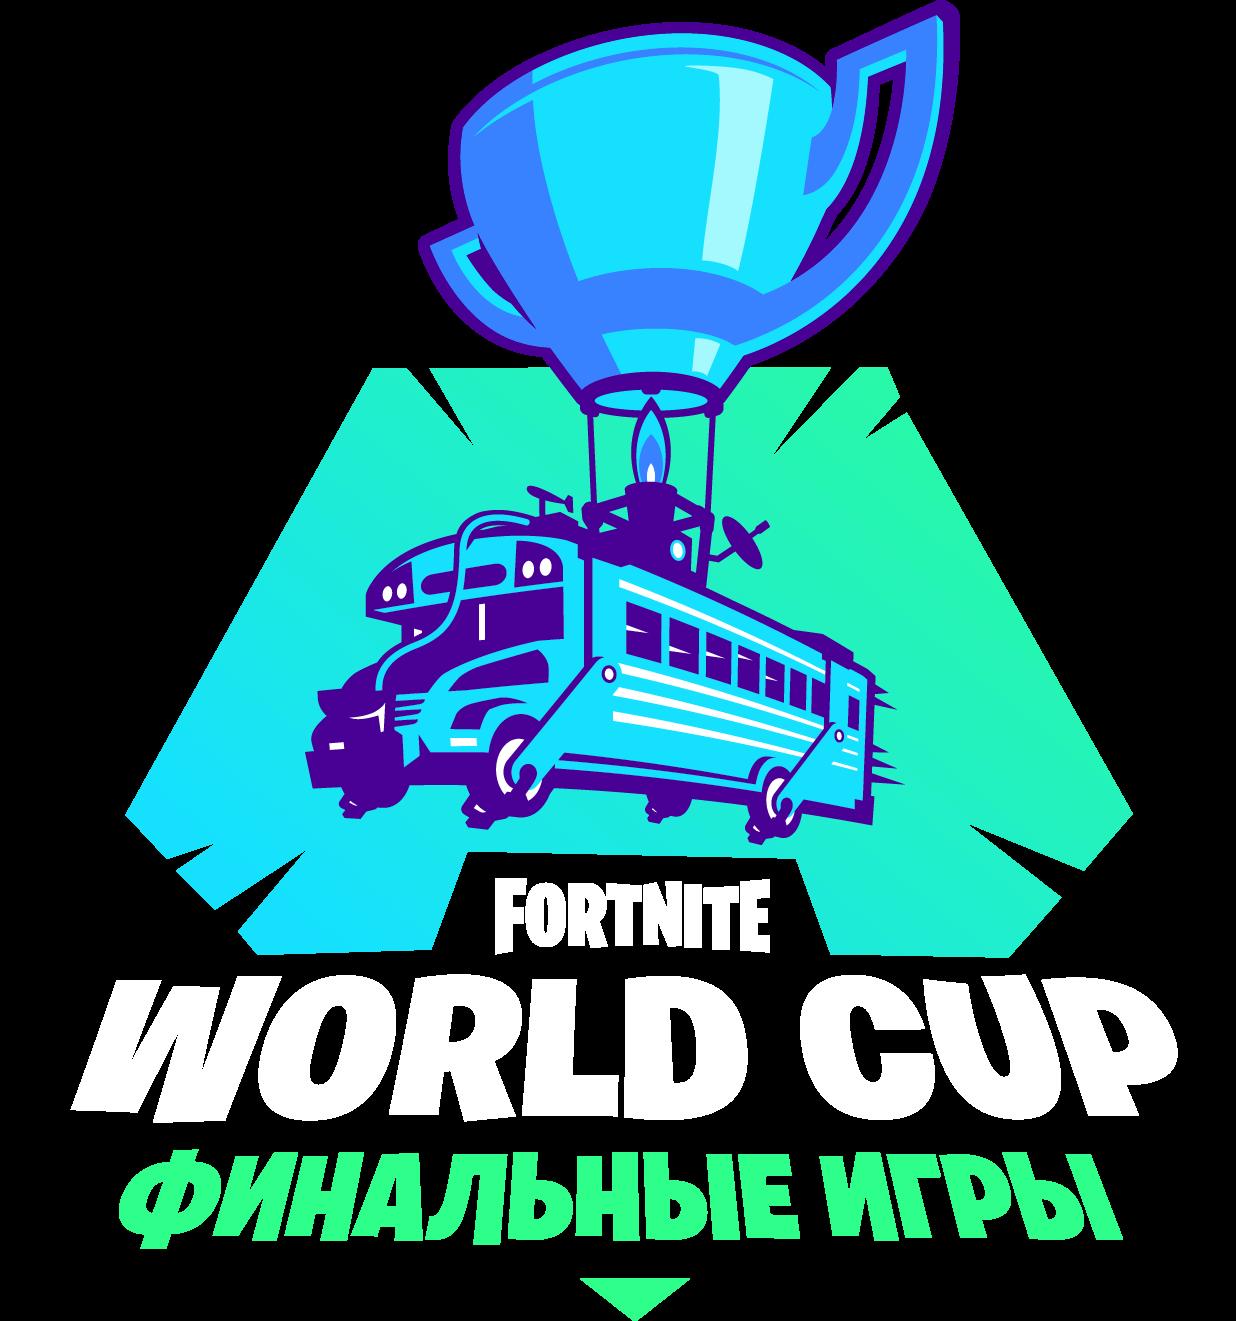 Fortnite leaderboards world cup